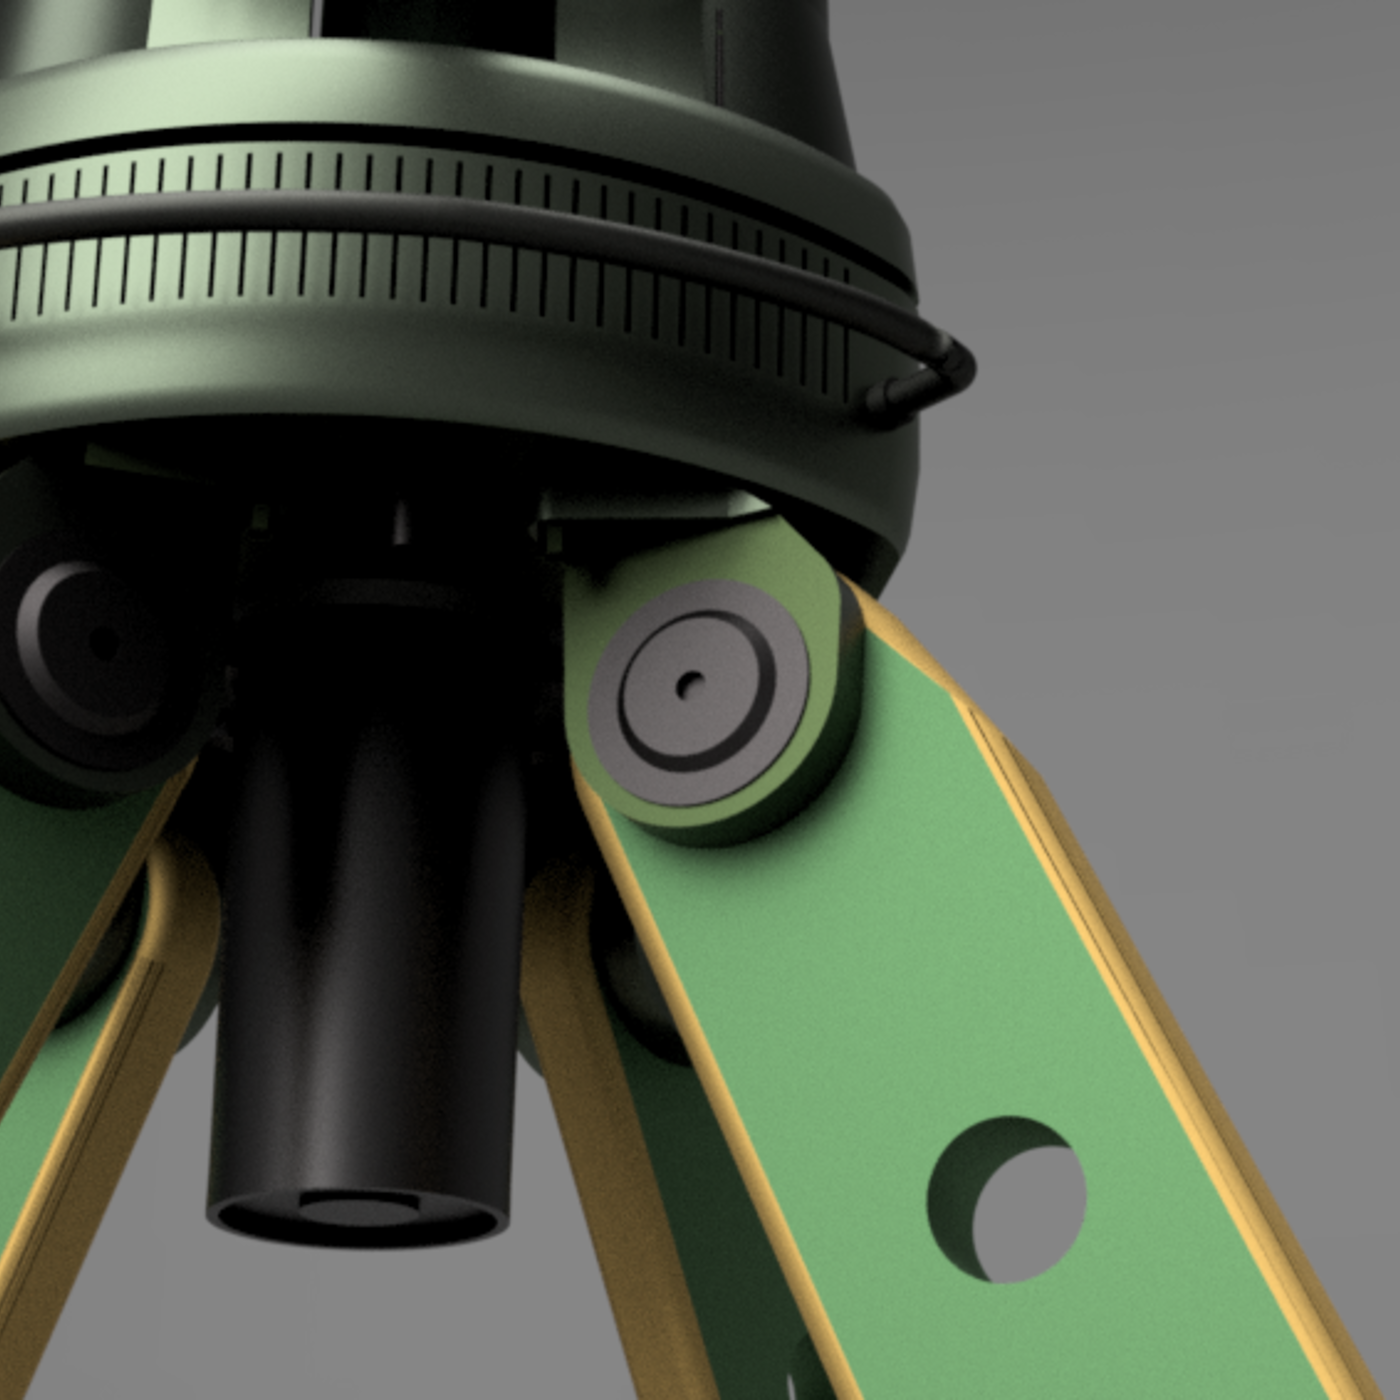 Sentry machine gun 2